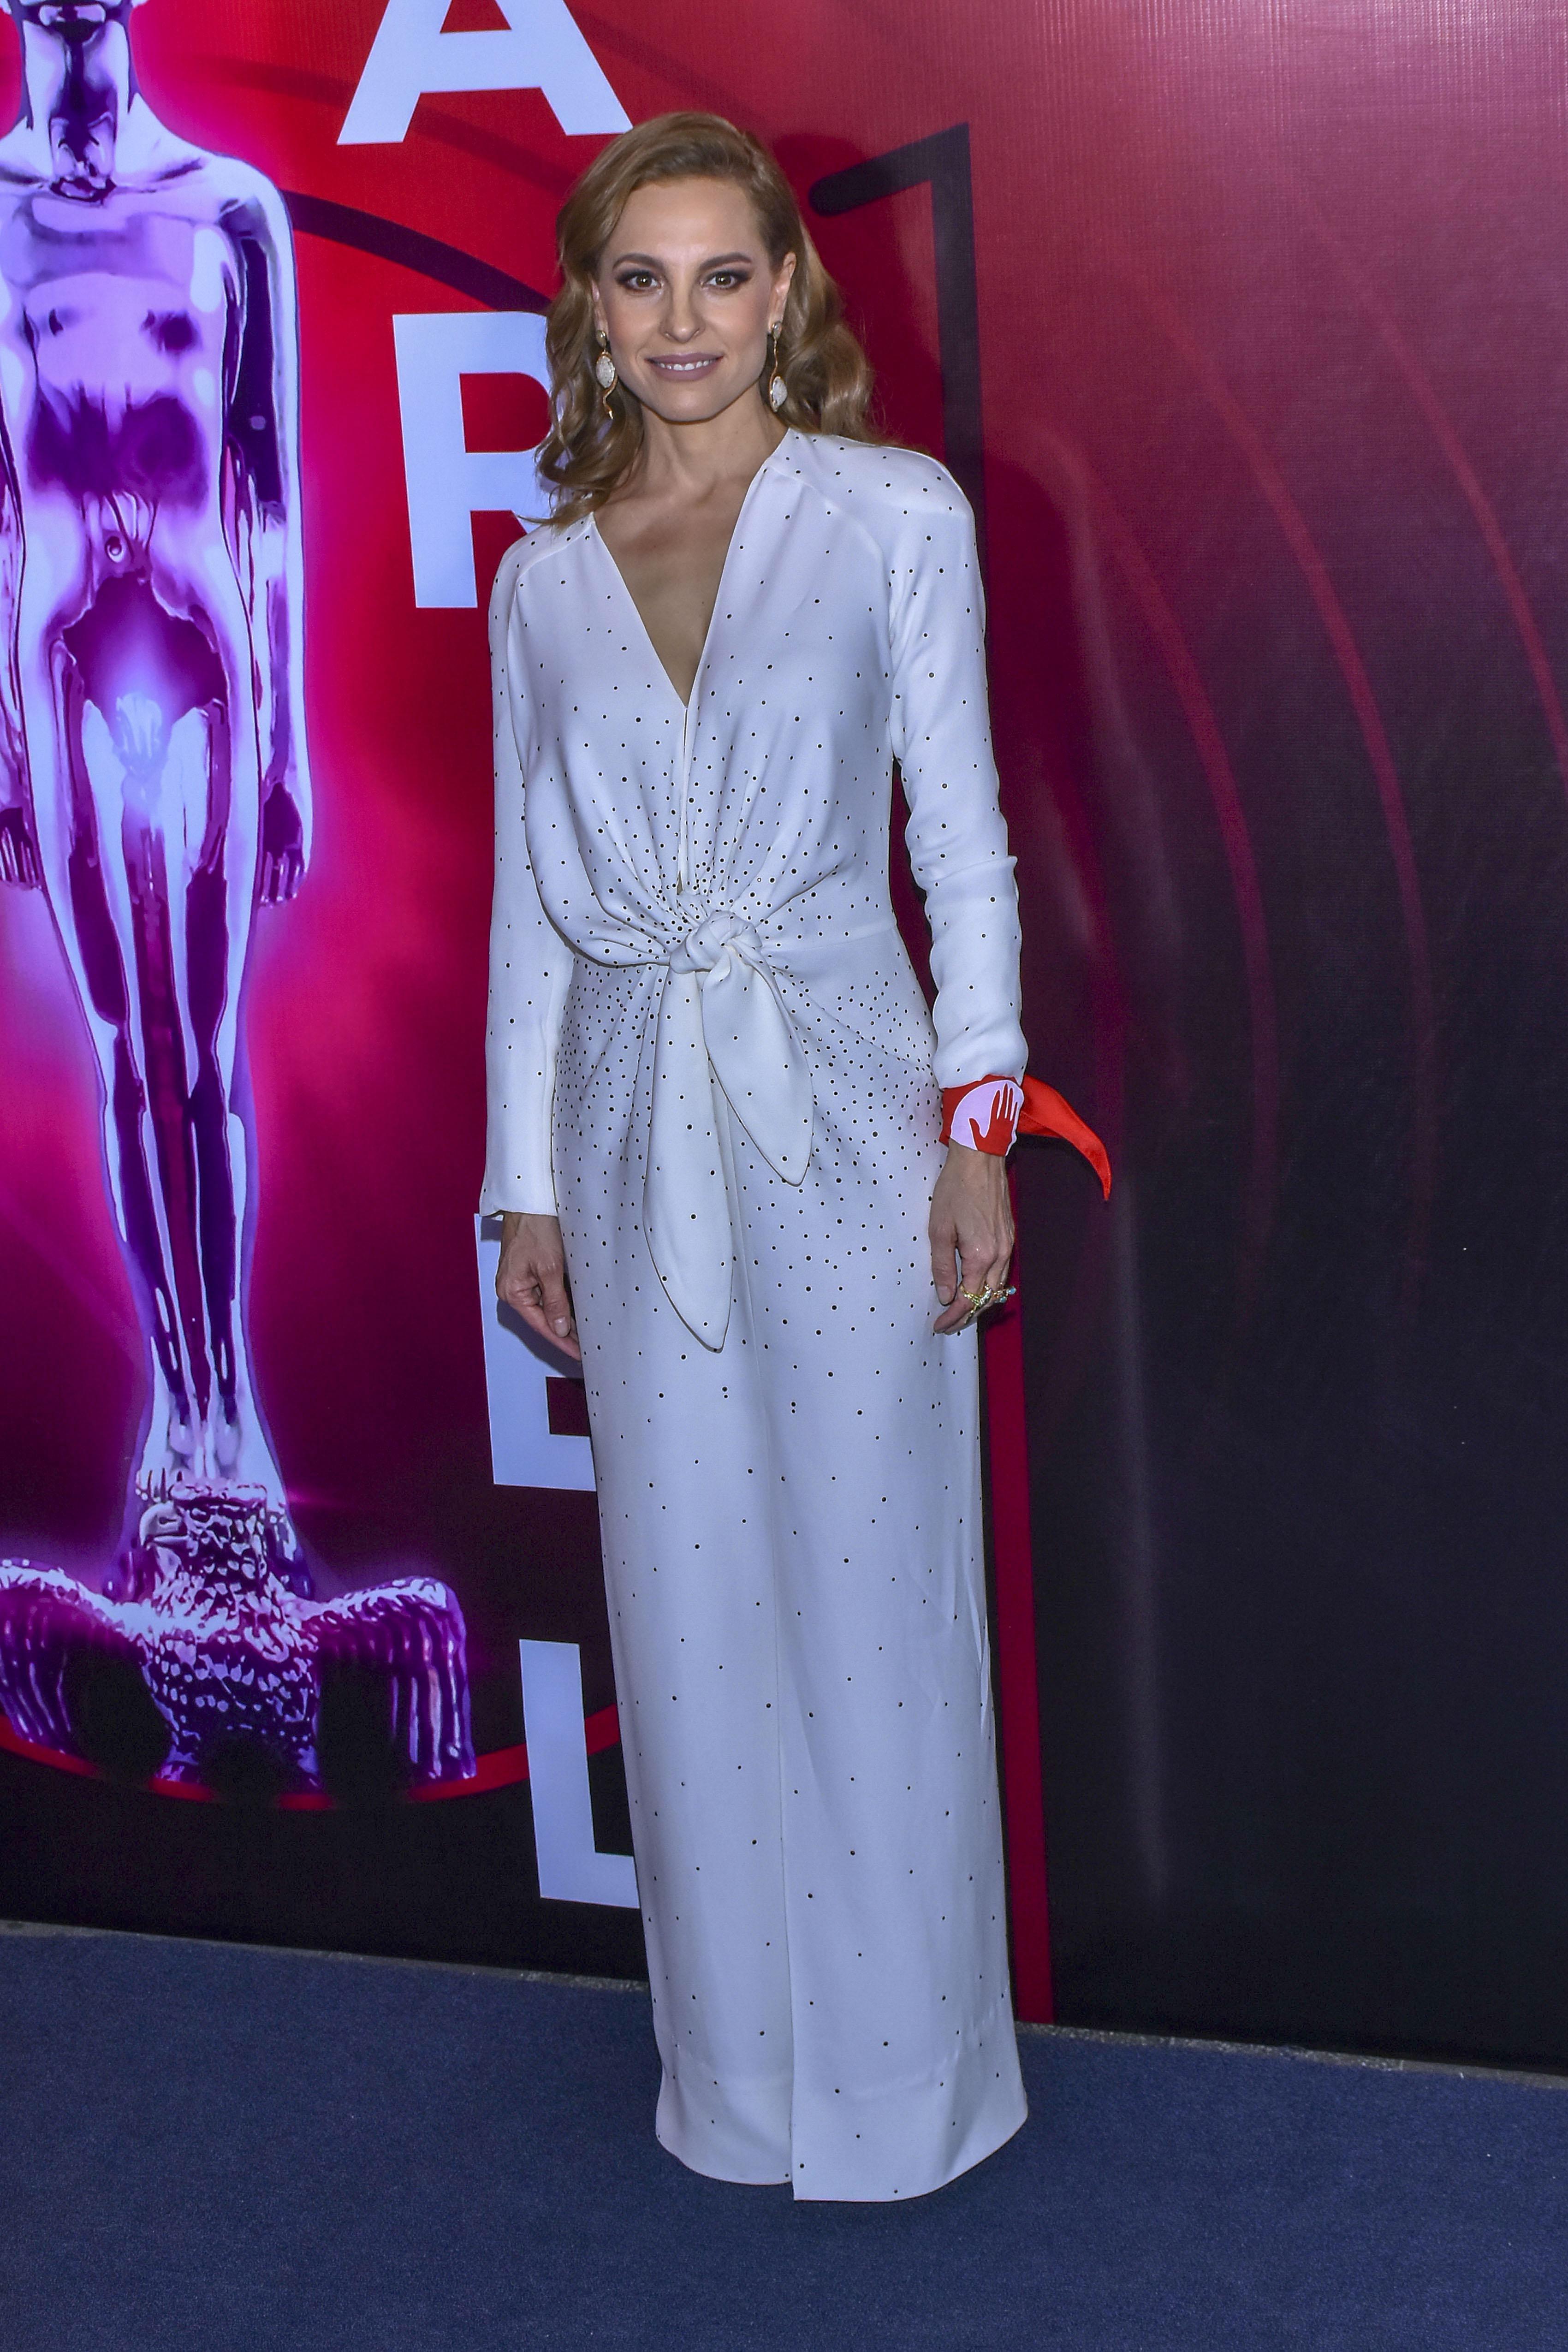 Marina de tavira, premios ariel, vestido, look